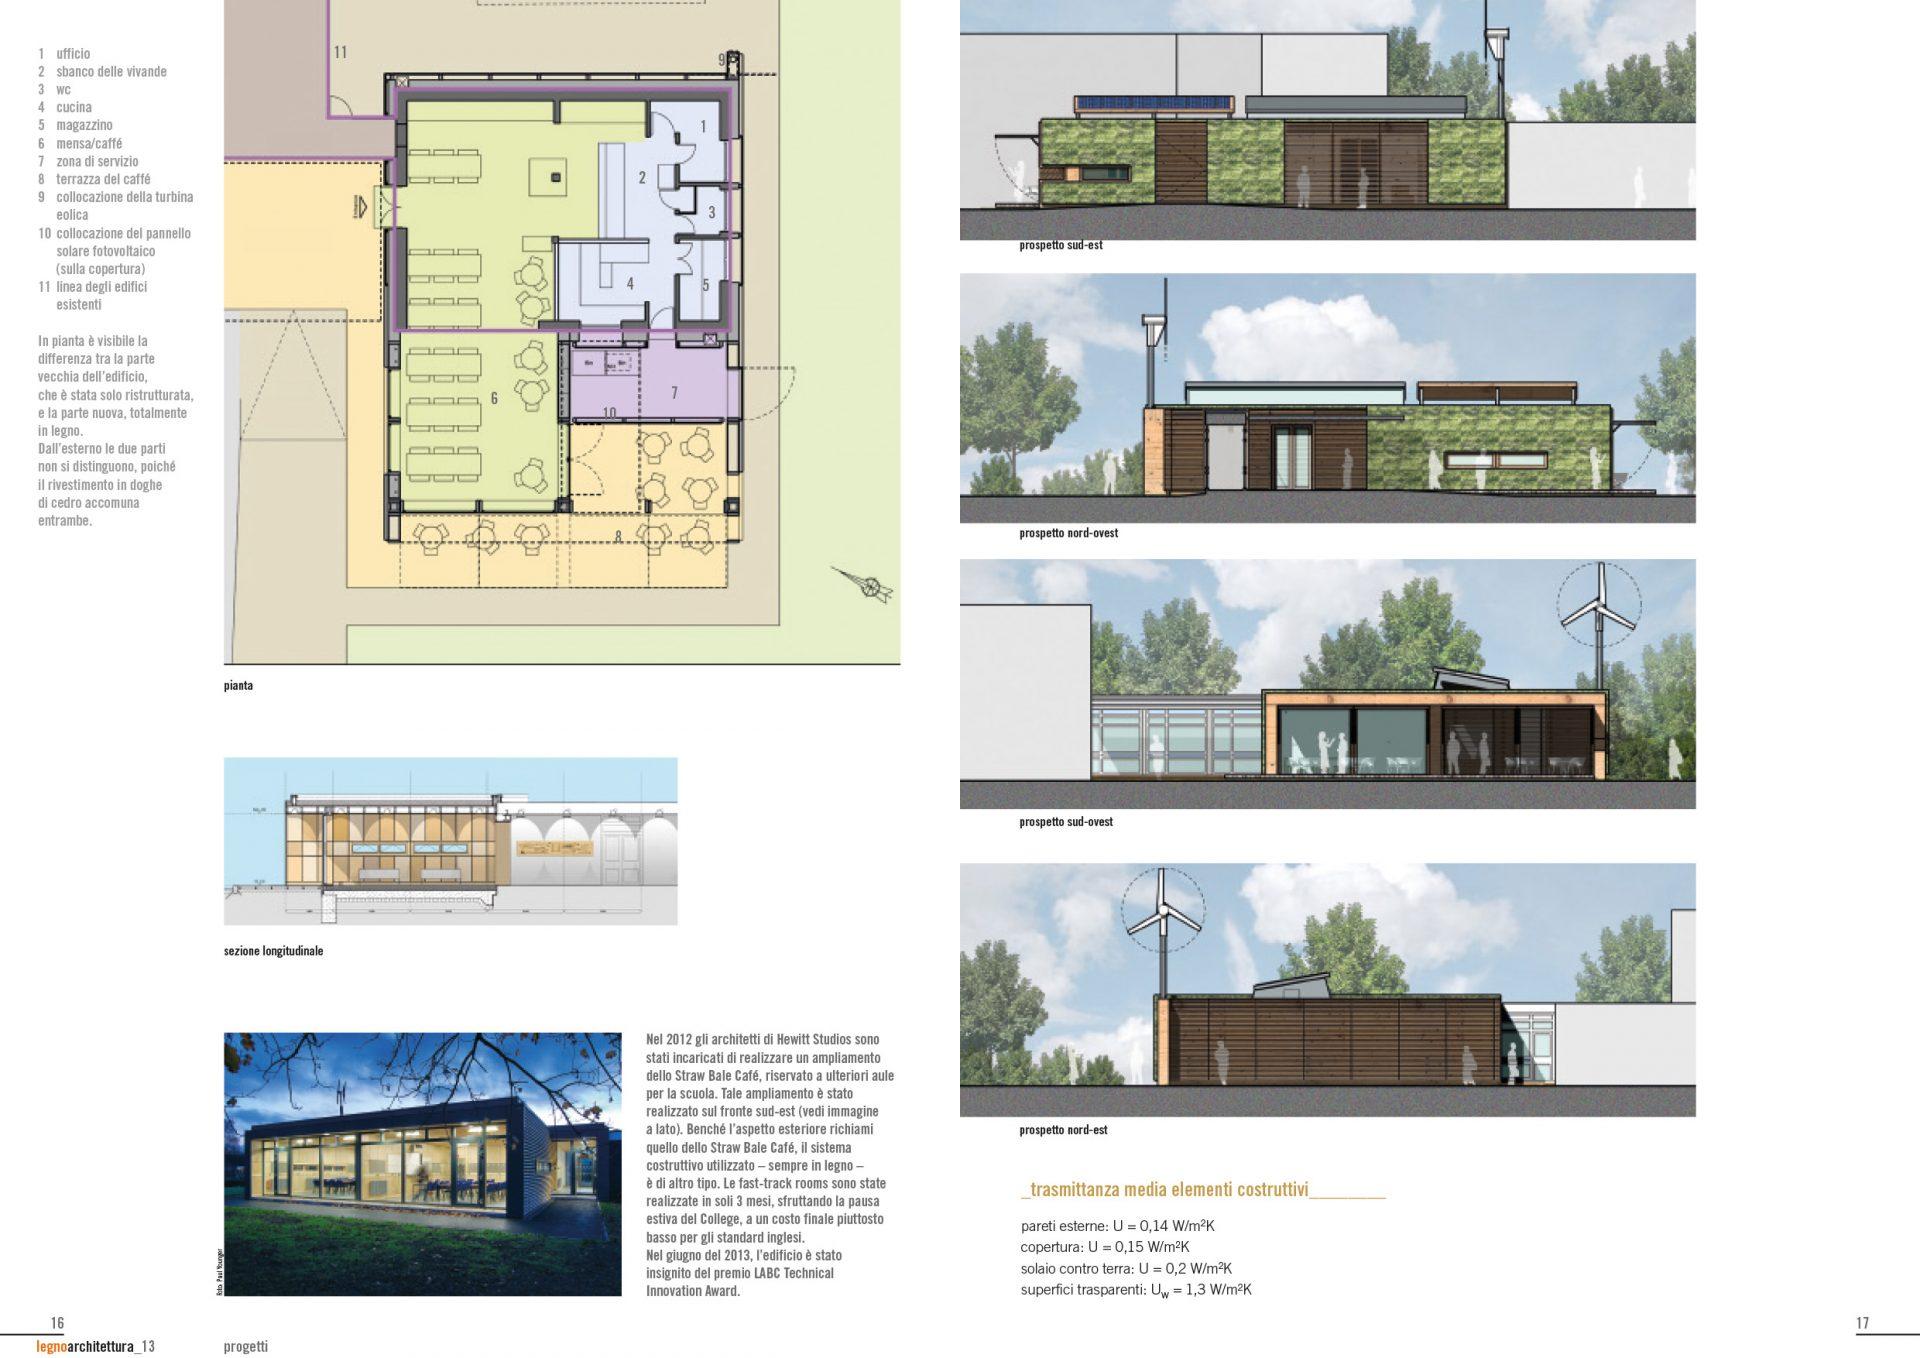 Legno Architettura Sbc Hewitt Studios